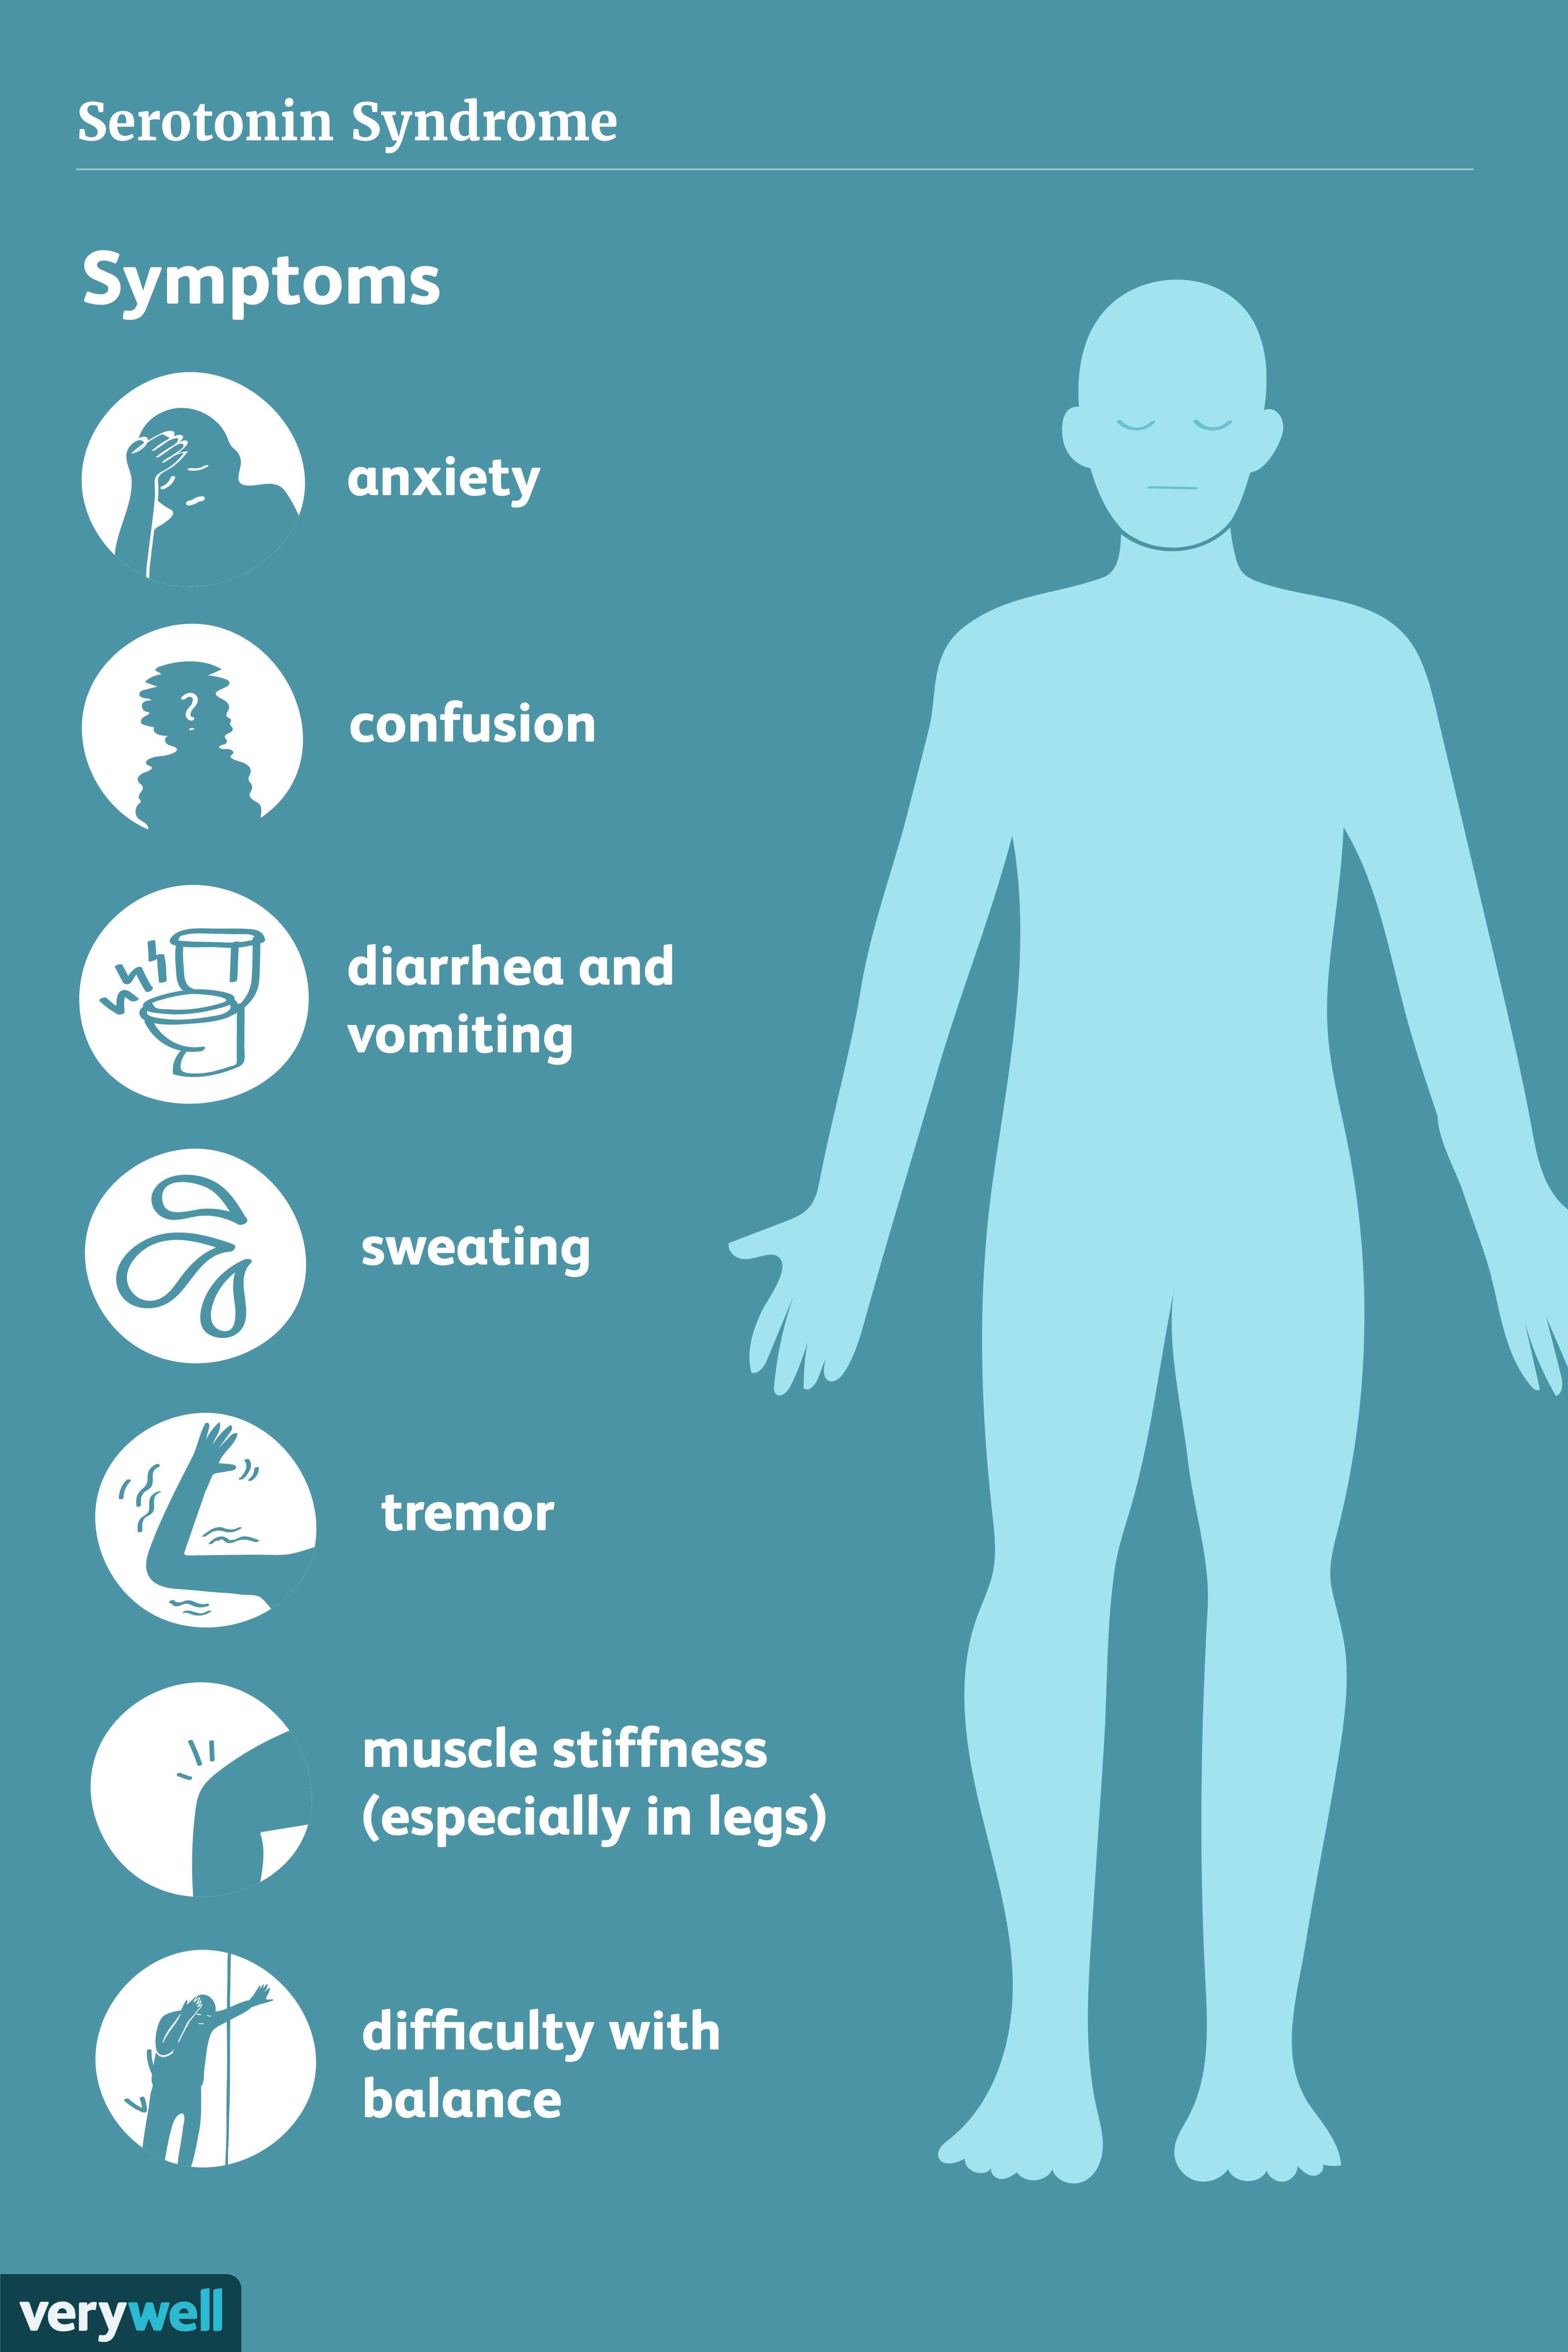 Serotonin syndrome symptoms